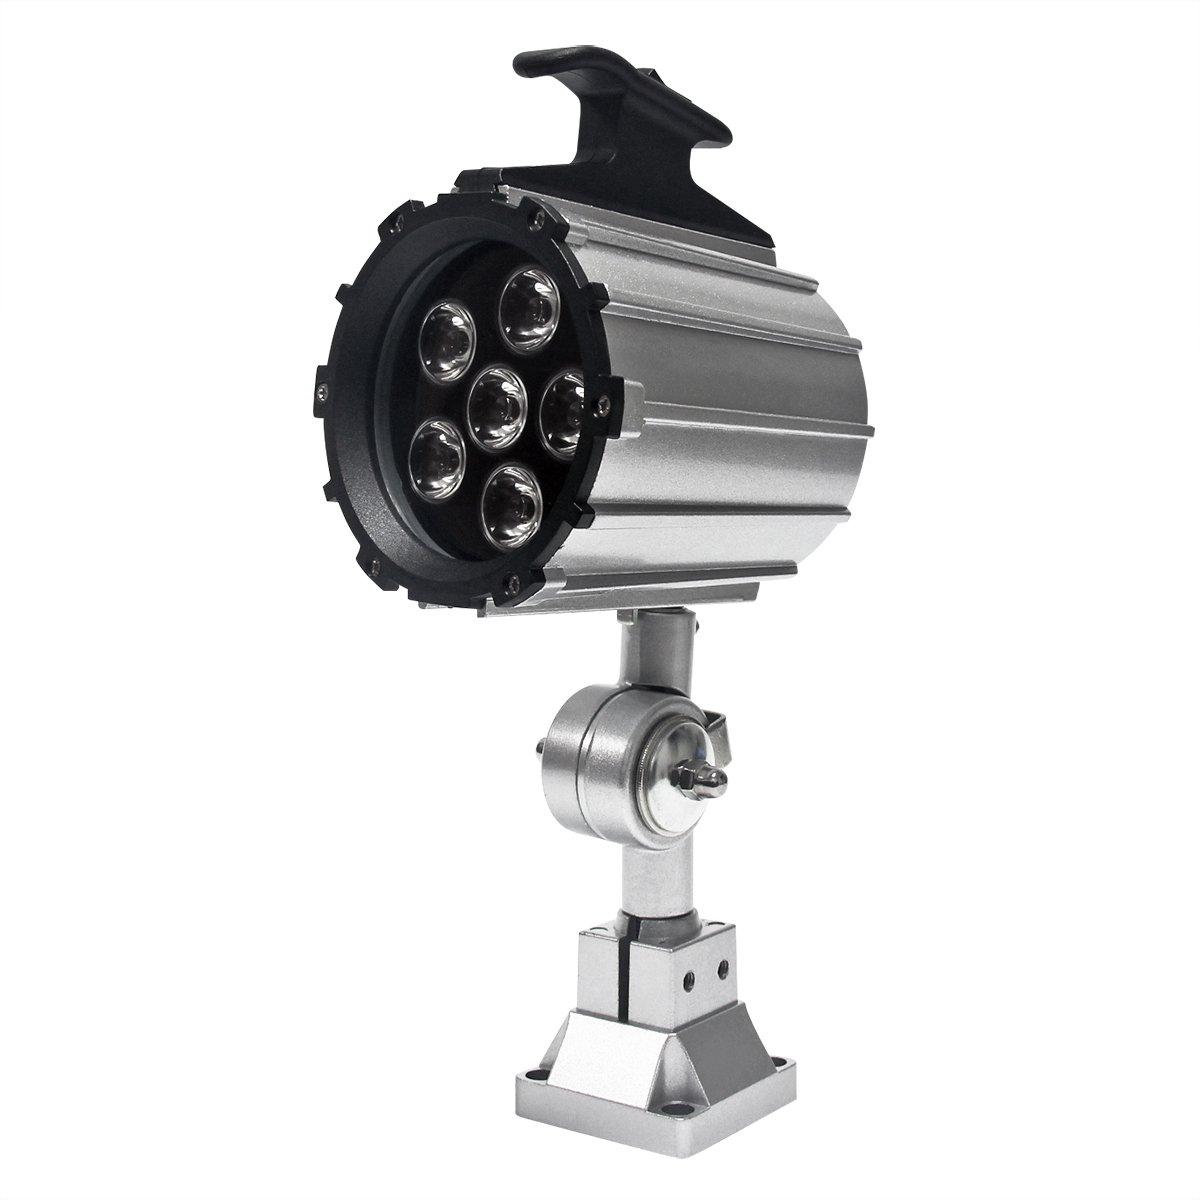 Wisamic LED Work Light for Lathe, CNC Milling Machine, Drilling Machine, Aluminum Alloy, 12W 110V-220V, Adjustable Multipurpose Worklight Short Arm